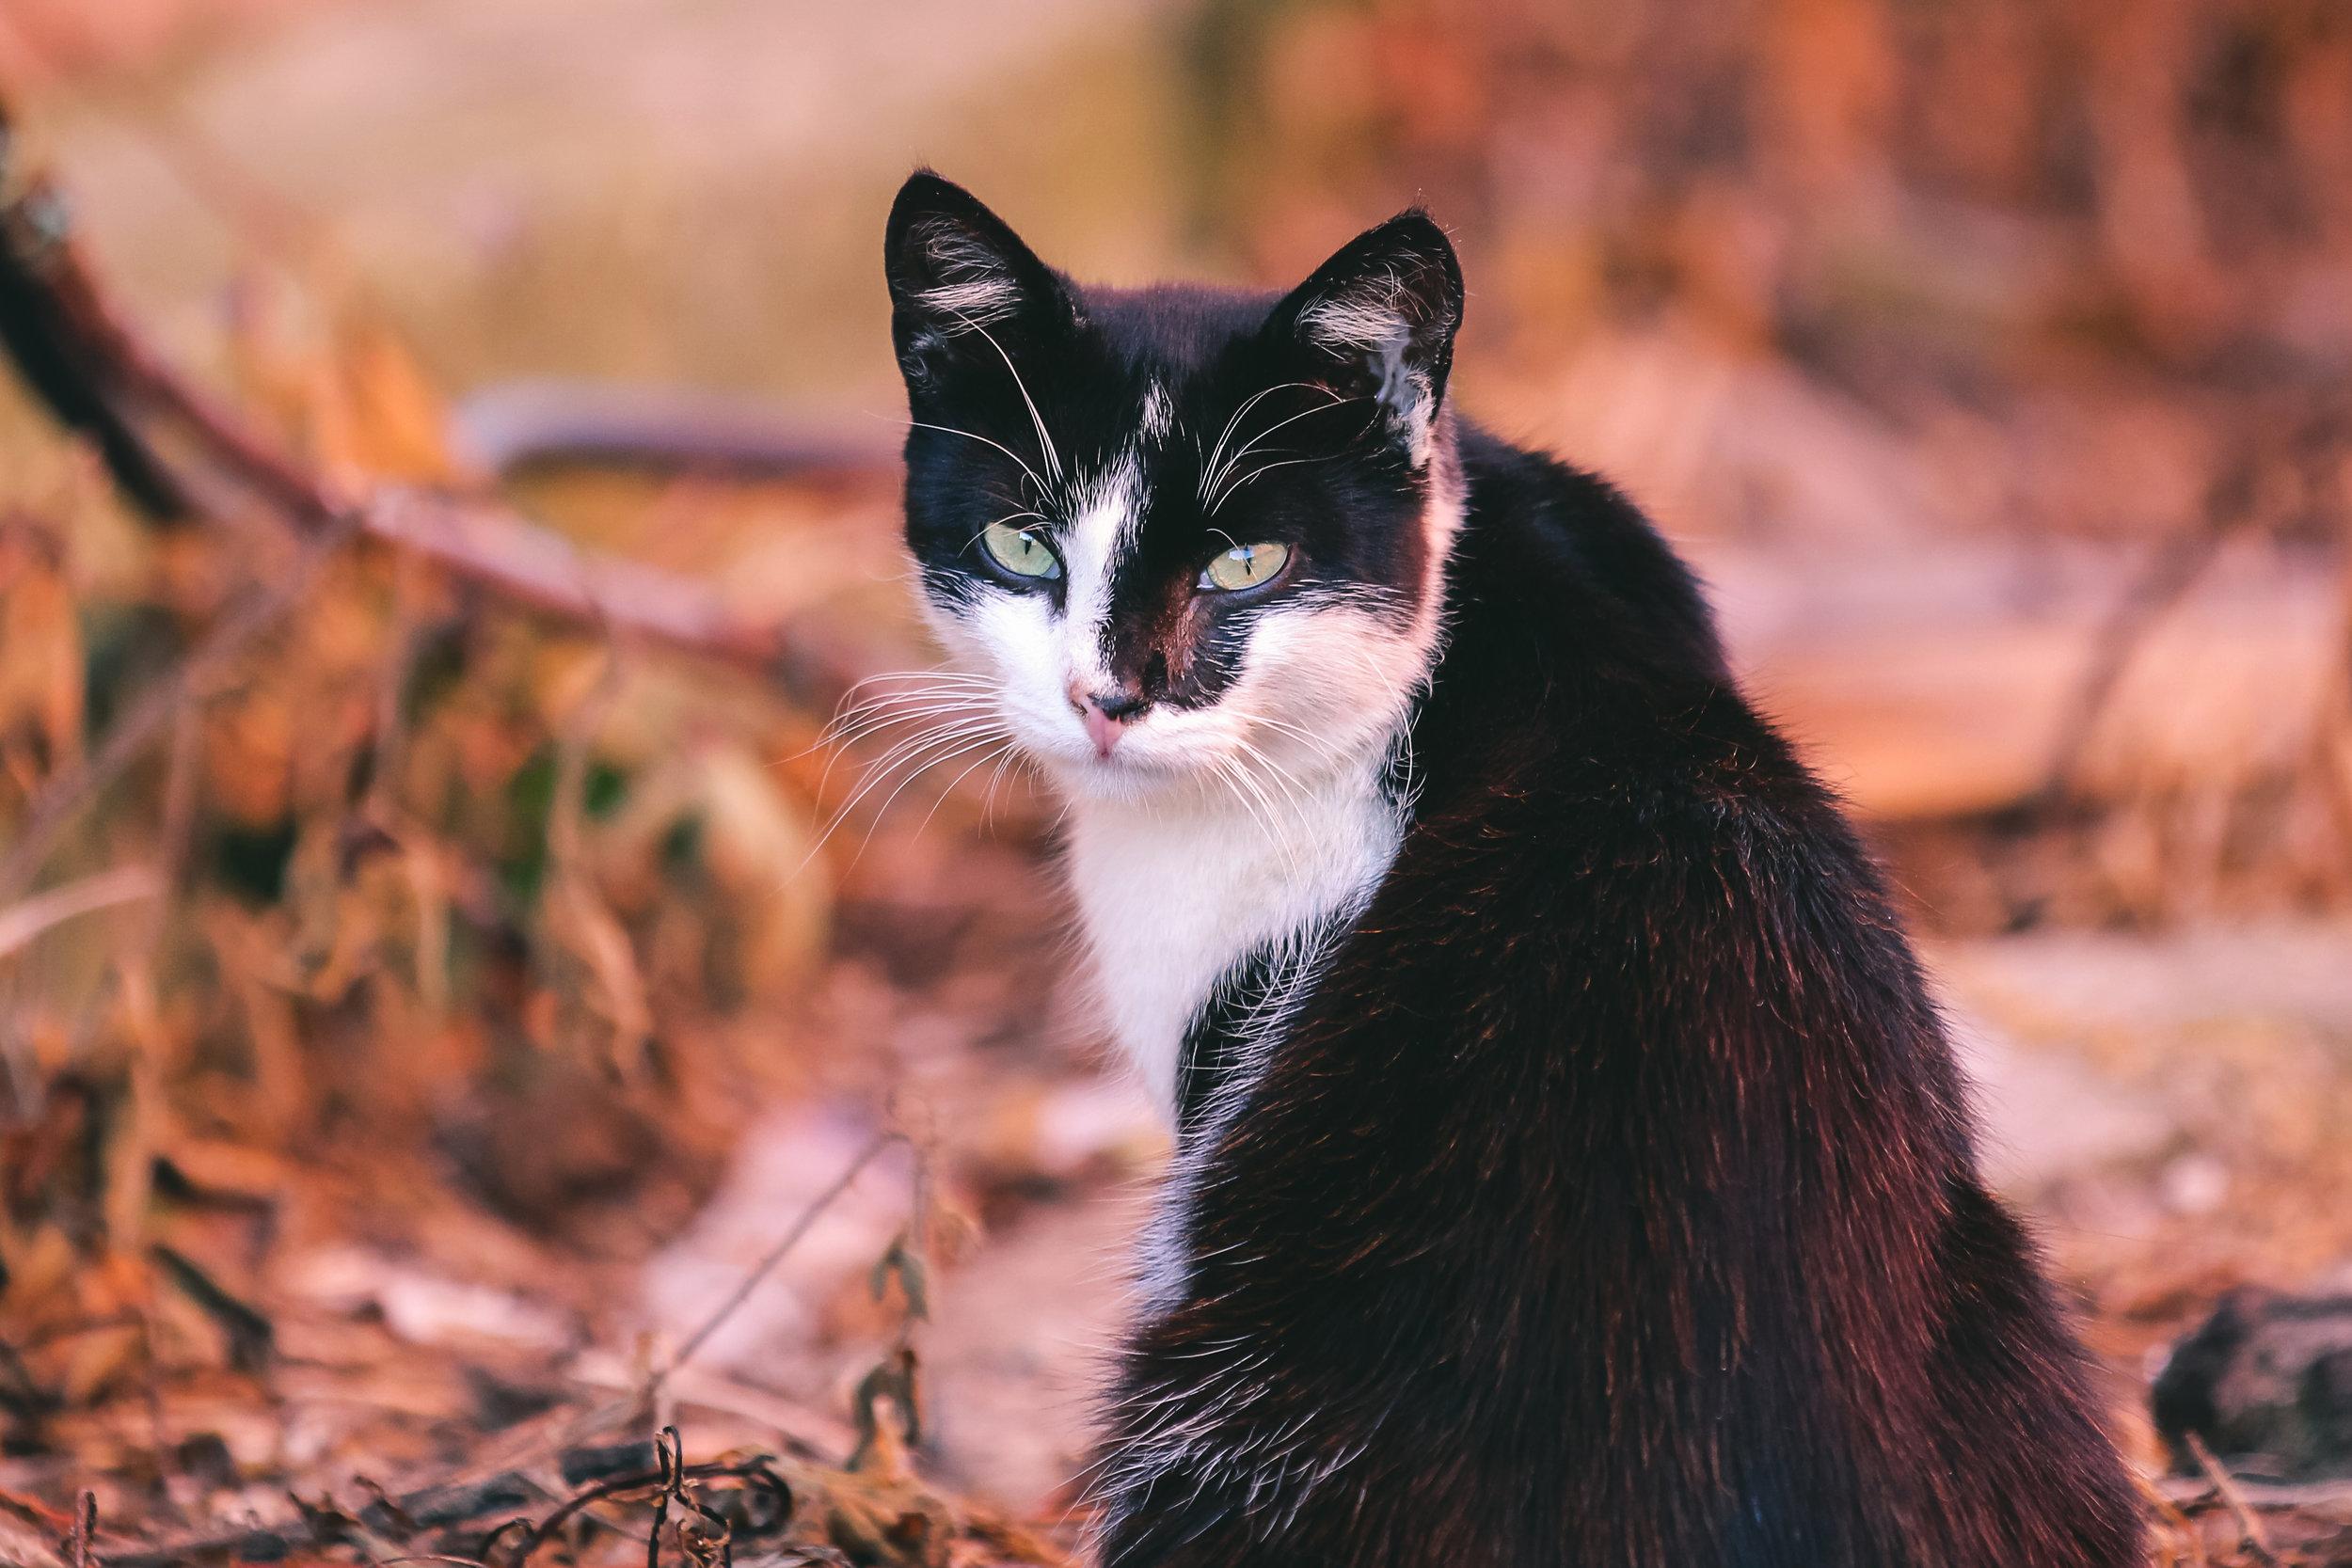 healthy cat by_onistocke-d7ryrw0.jpg